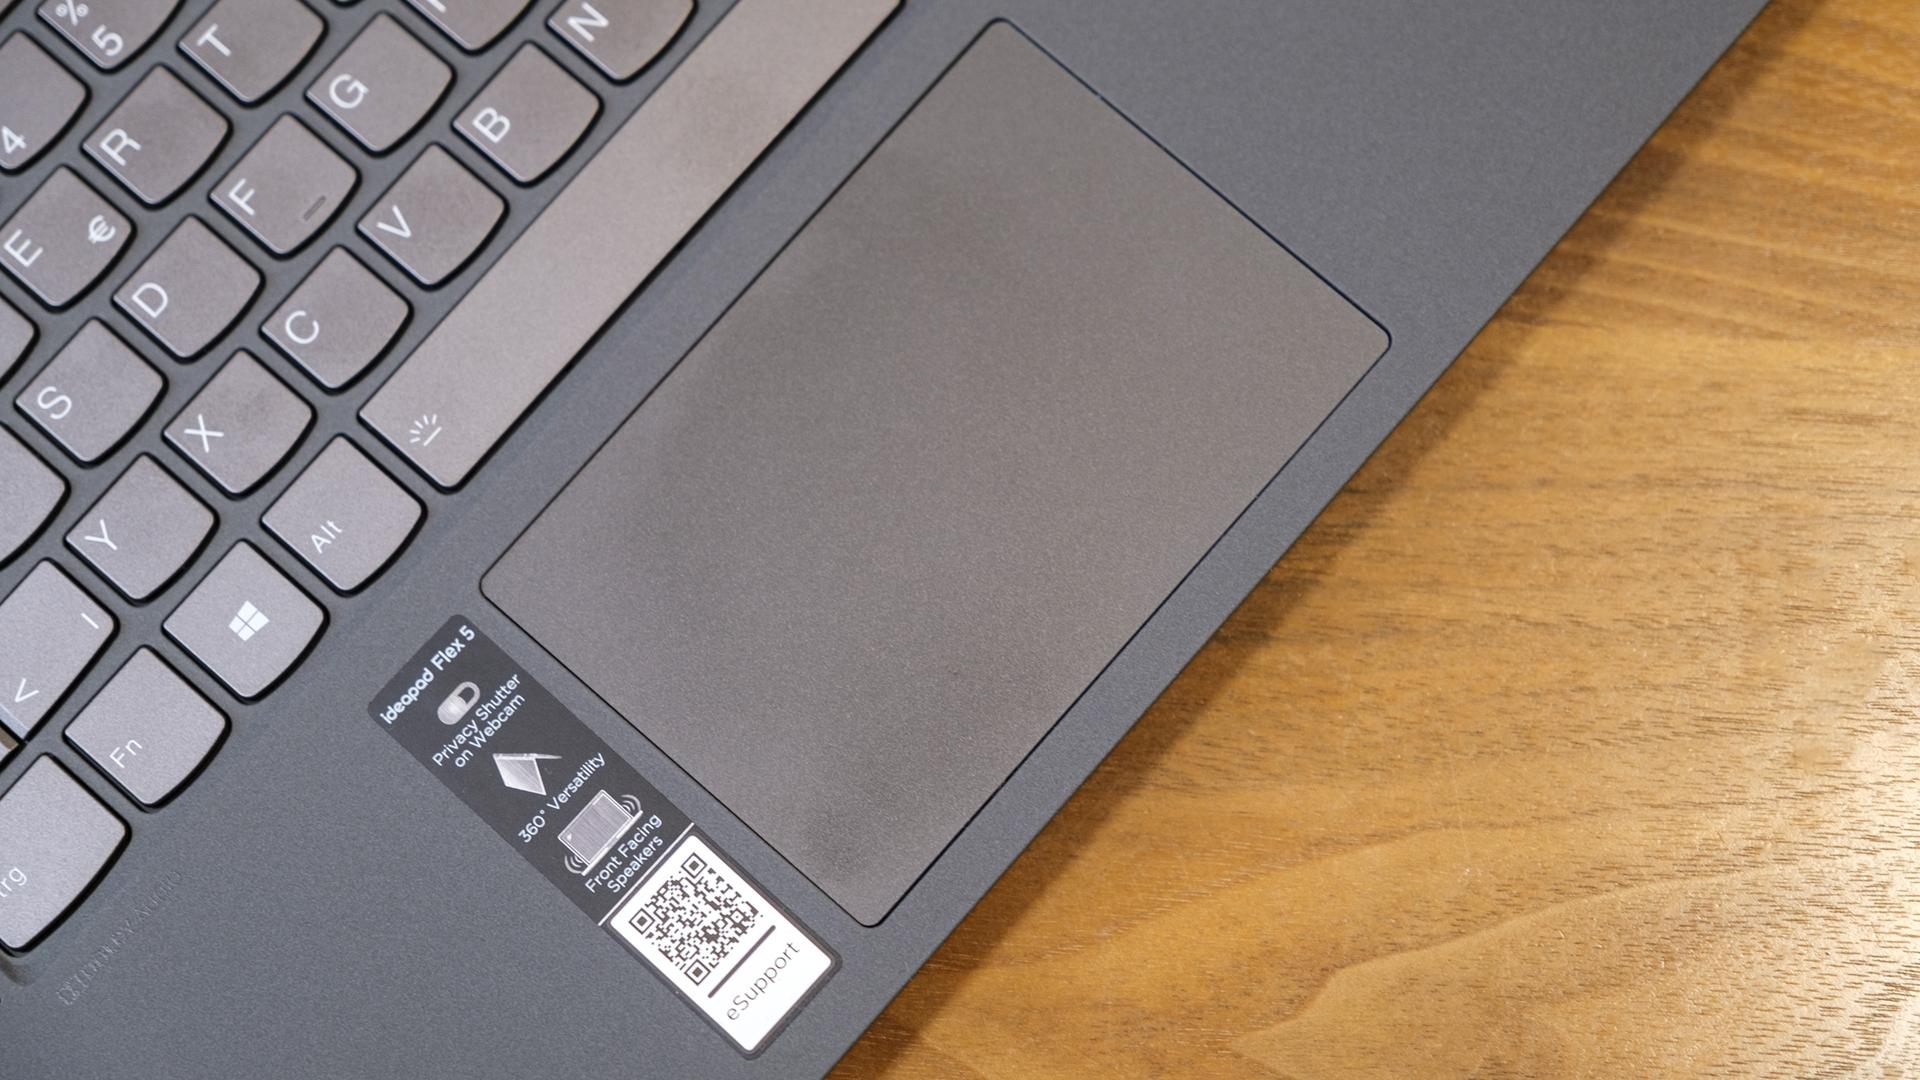 Lenovo IdeaPad Flex 5 AMD Ryzen 5700U Touchpad